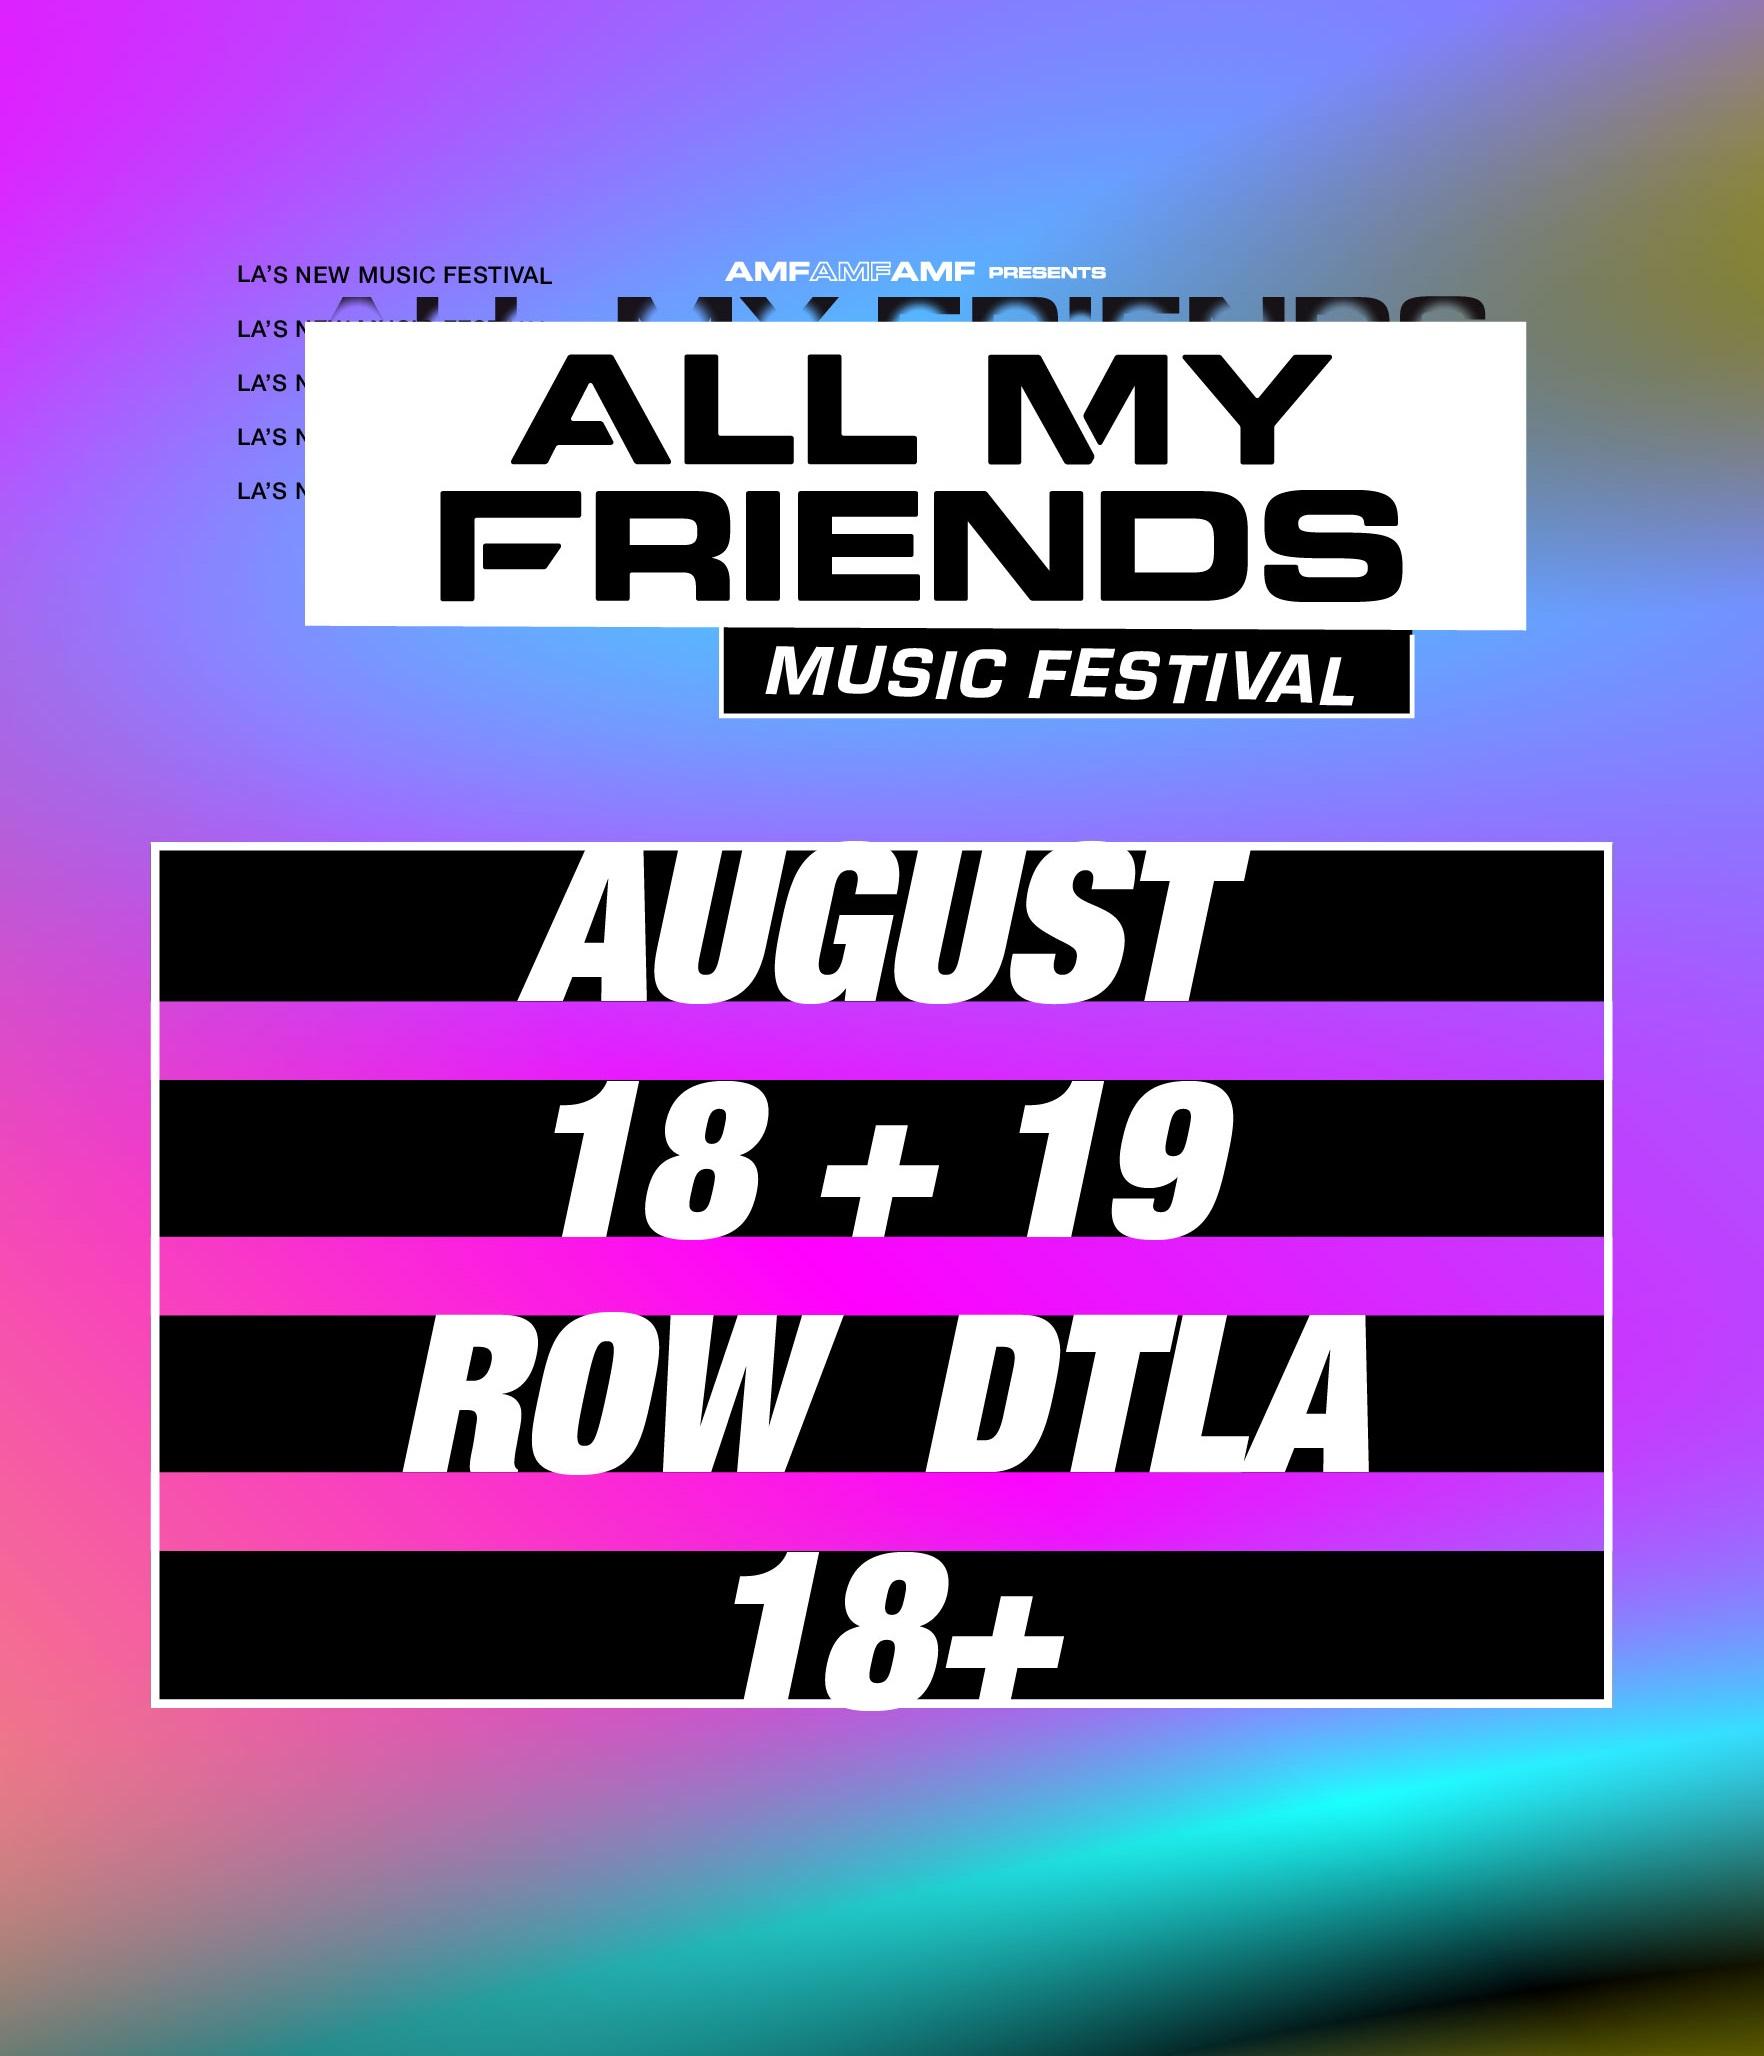 all my friends music festival 2018 dates ticket info